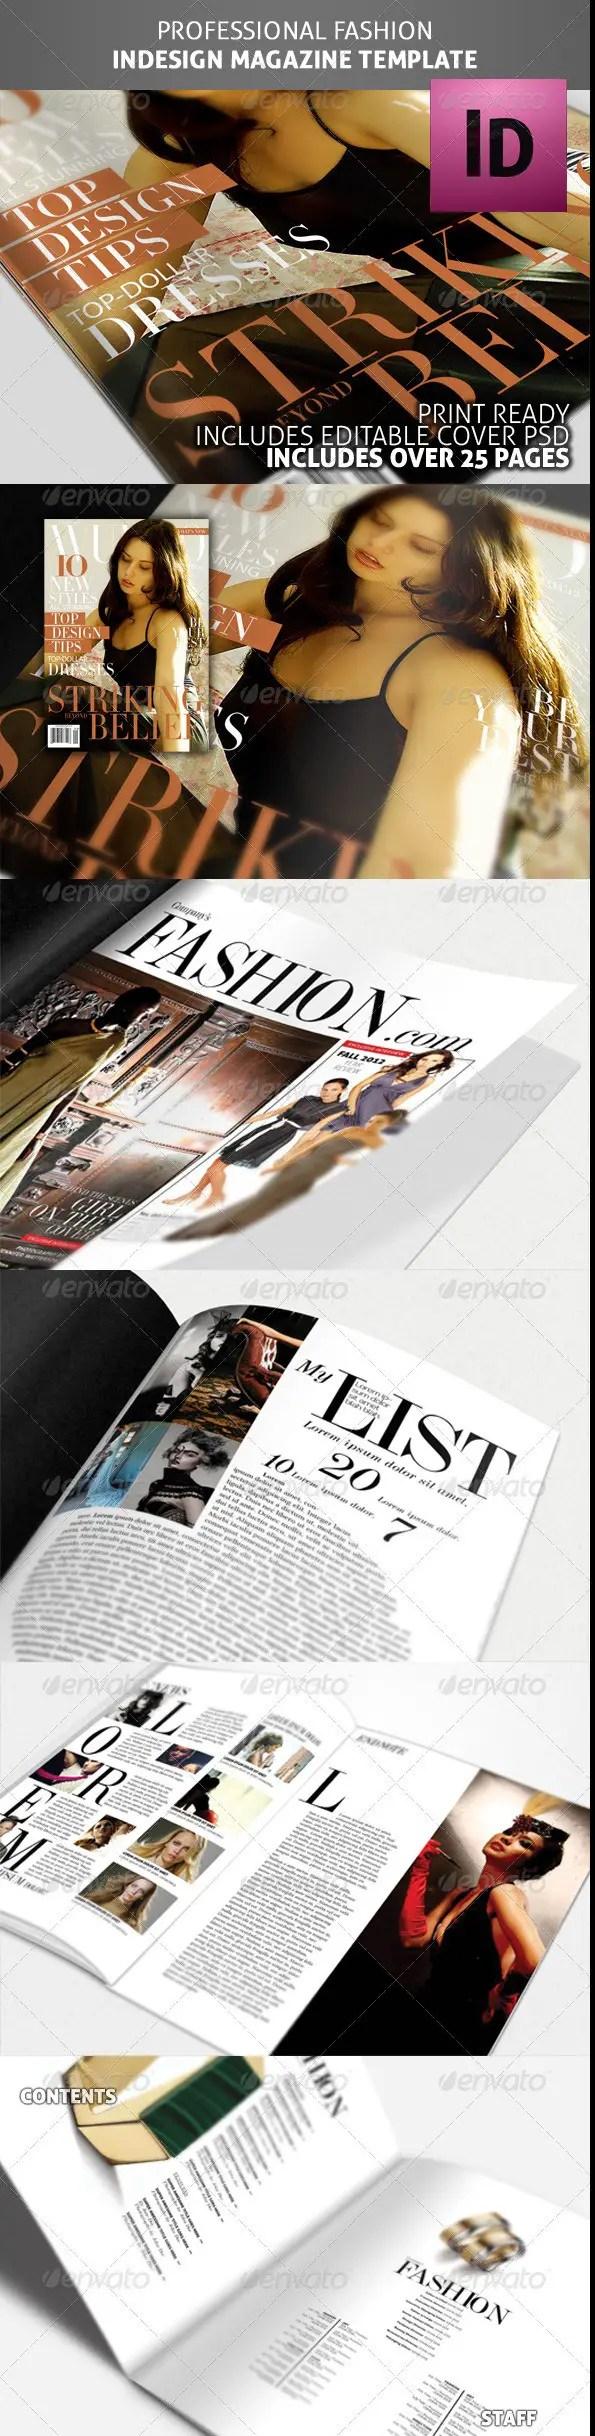 Pro InDesign Fashion Magazine Template